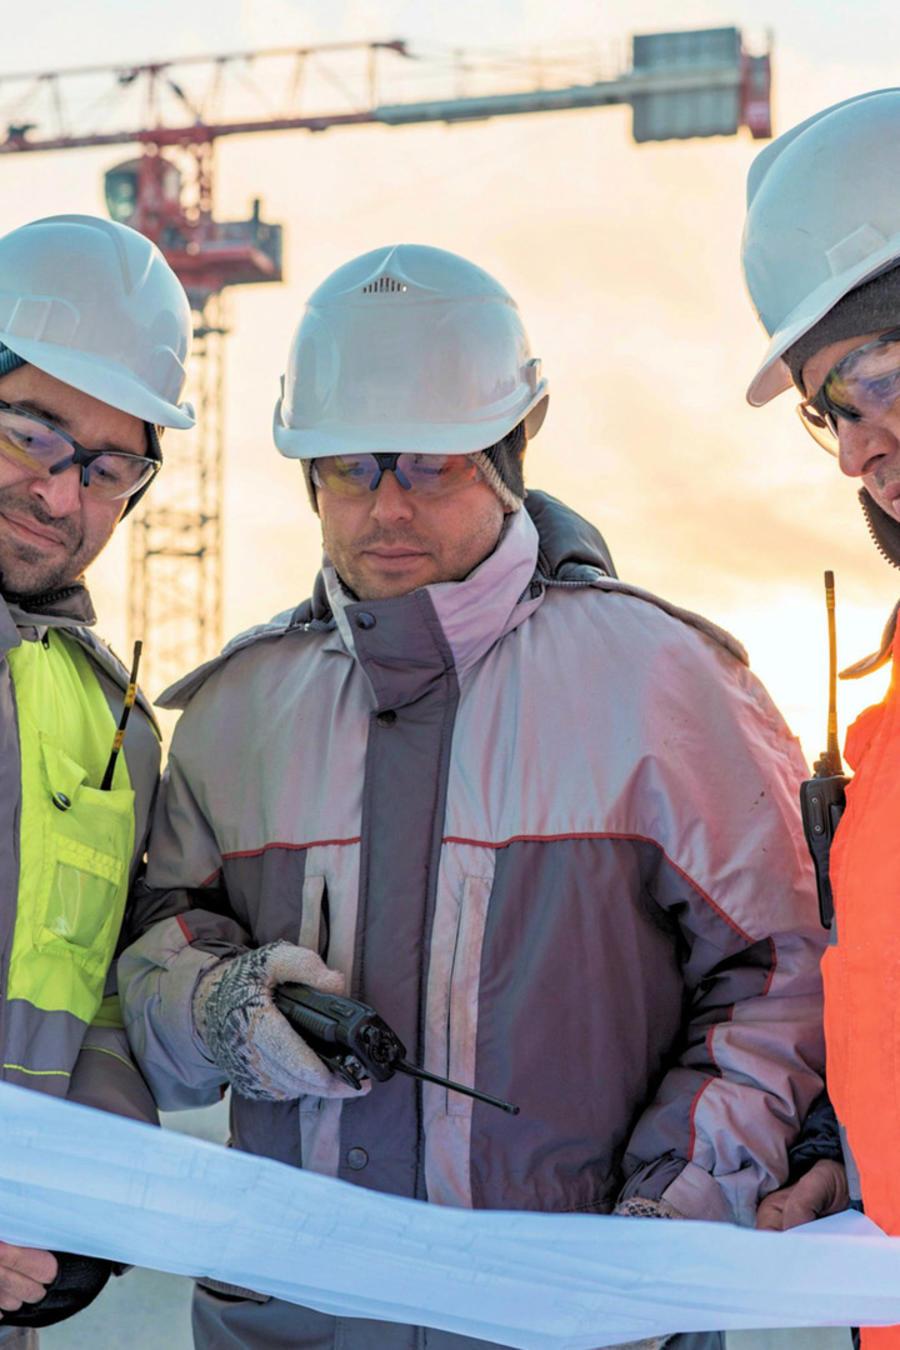 Ingenieros civiles trabajando